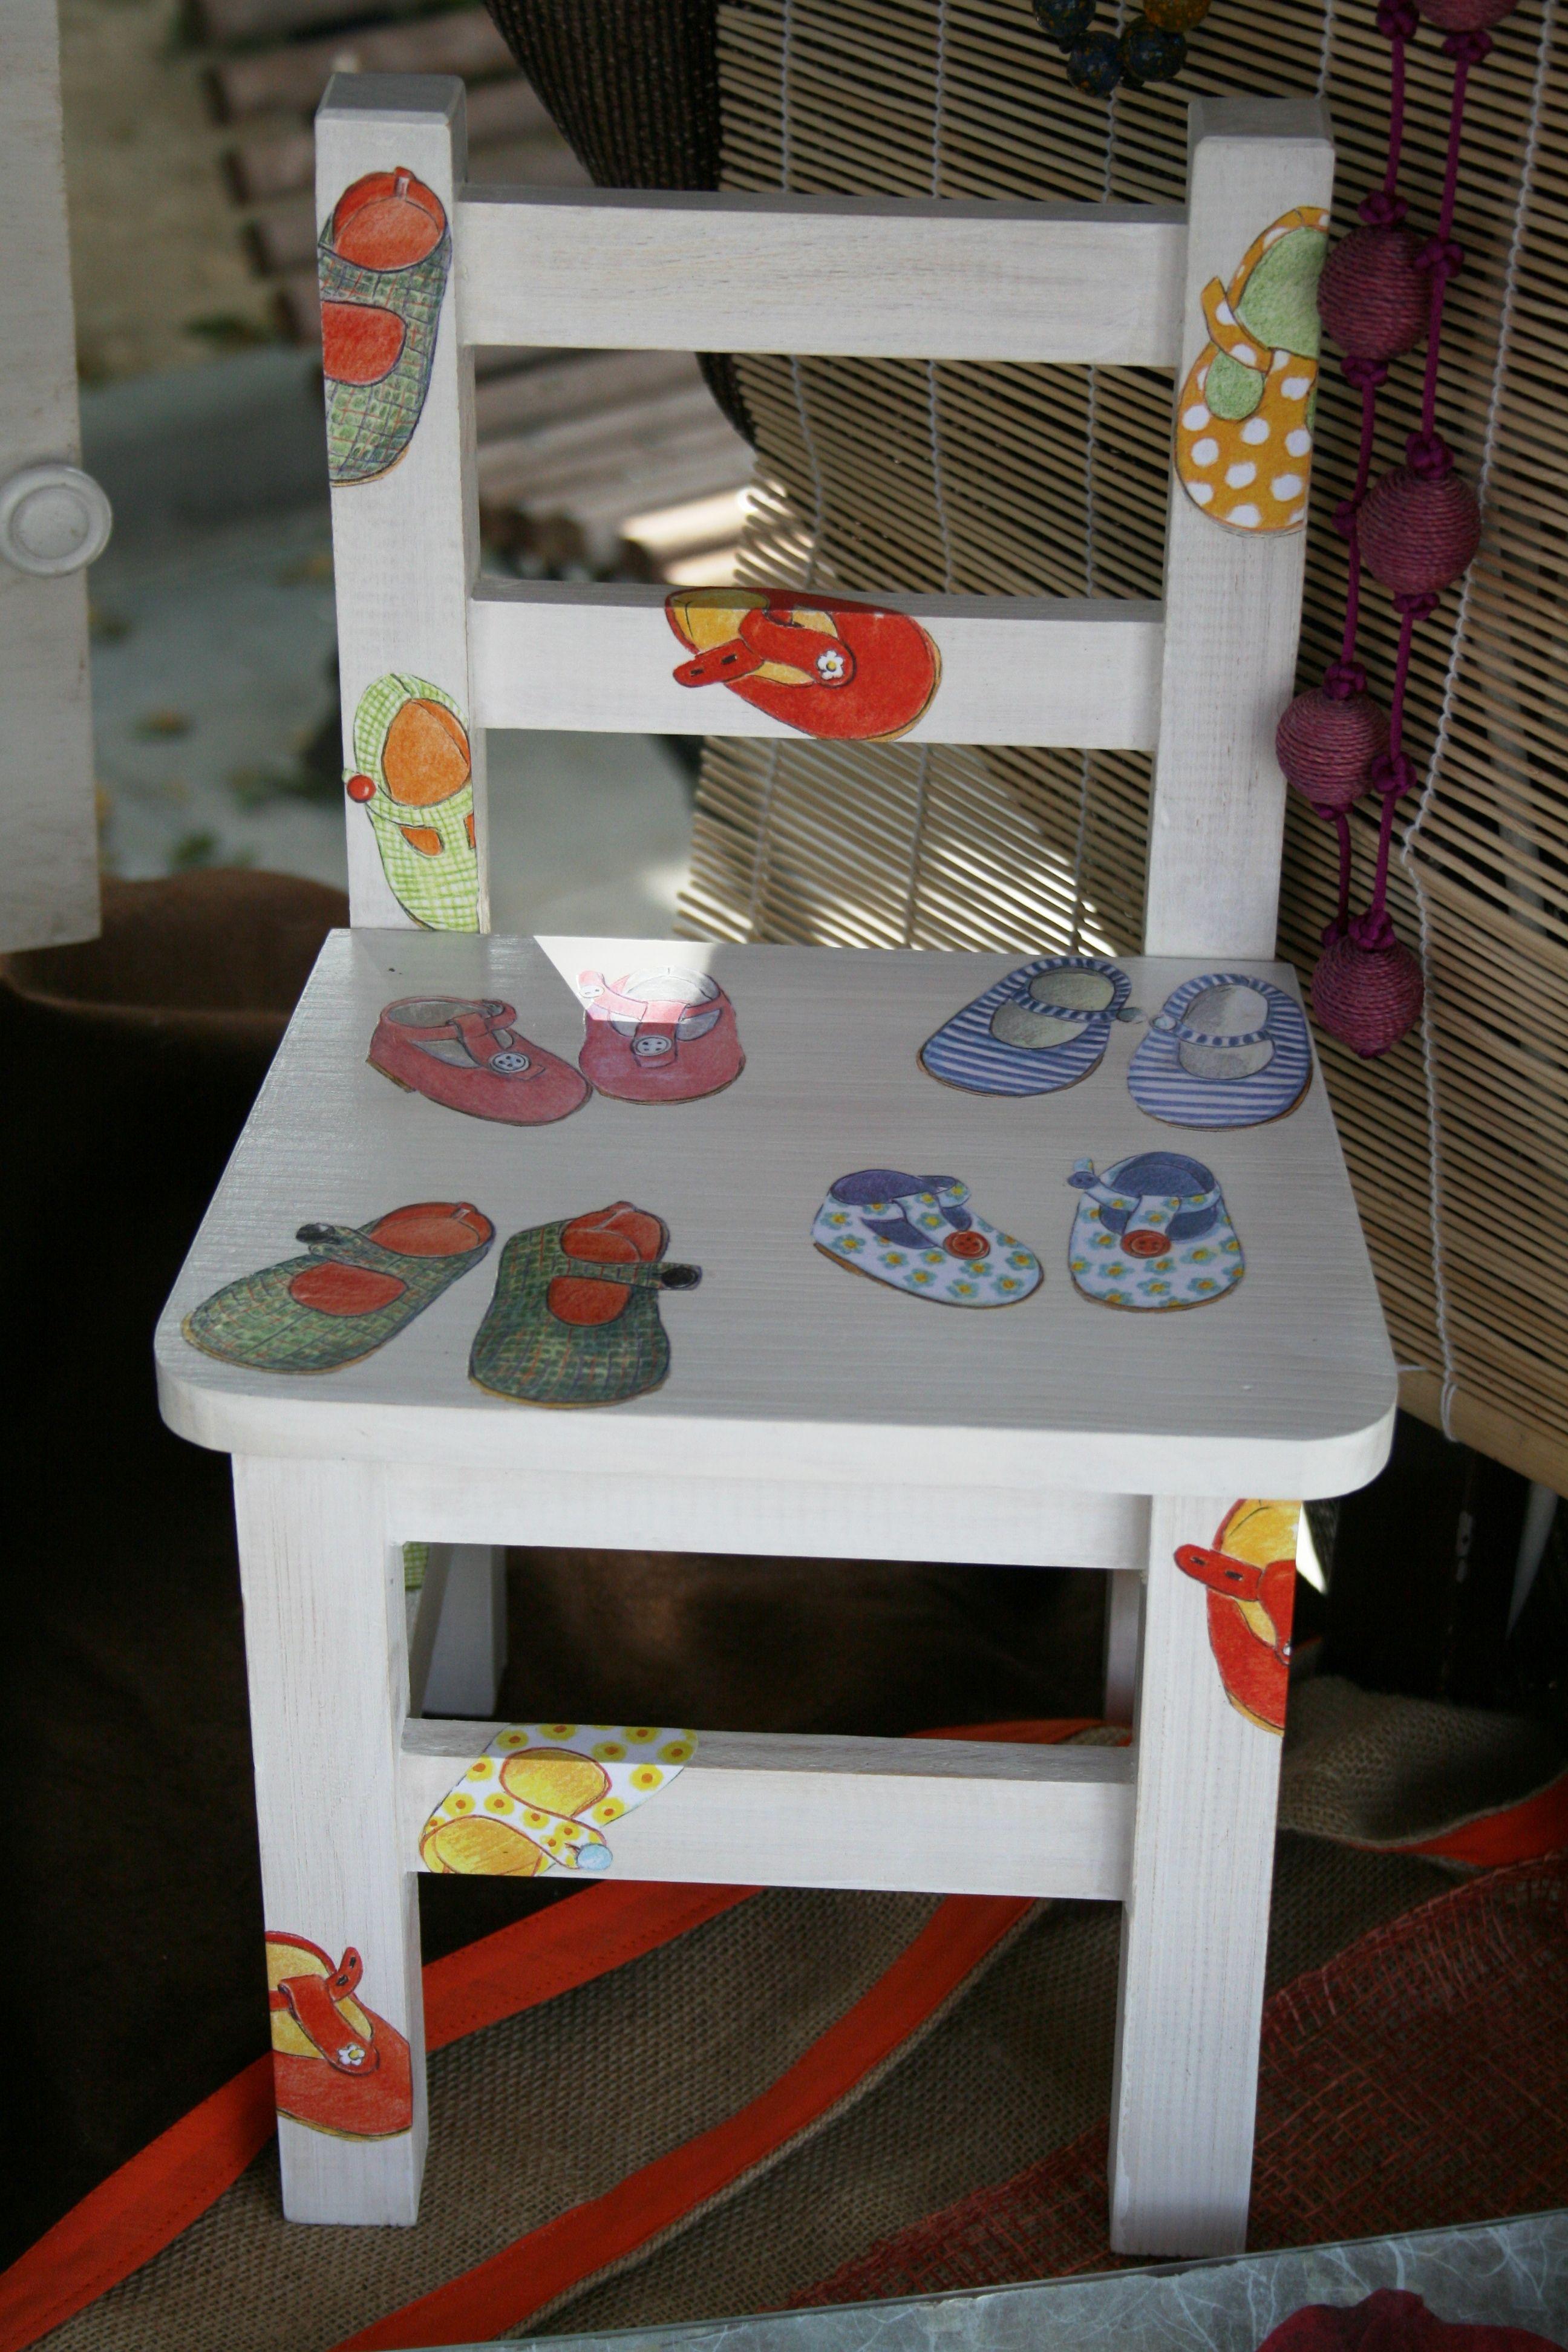 Silla infantil sillas infantiles pinterest sillas - Silla infantil madera ...